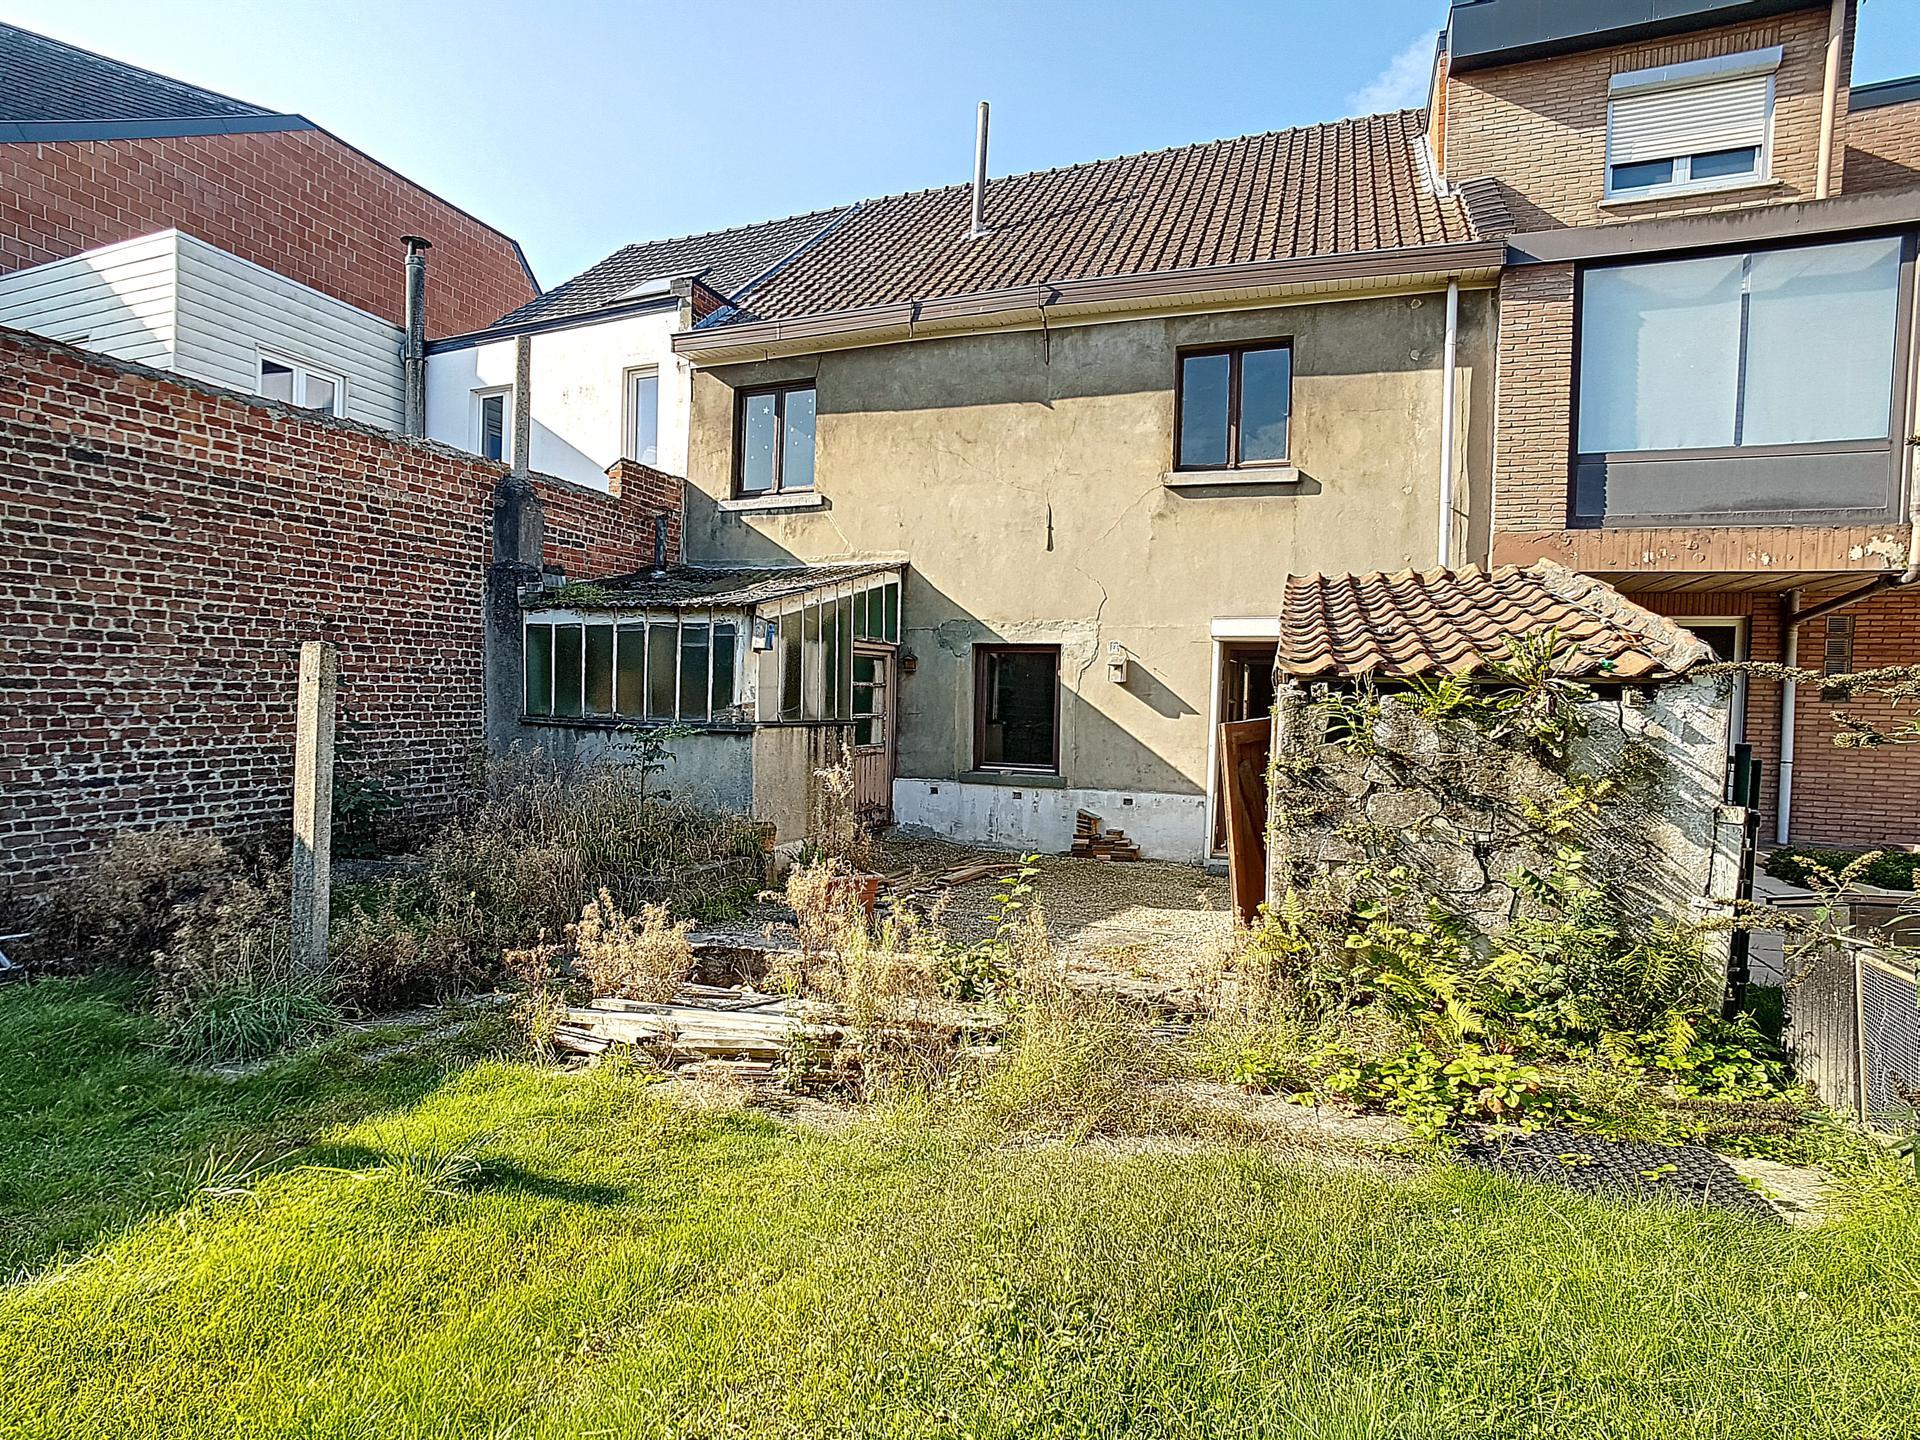 Maison - Zaventem Sterrebeek - #4507431-4